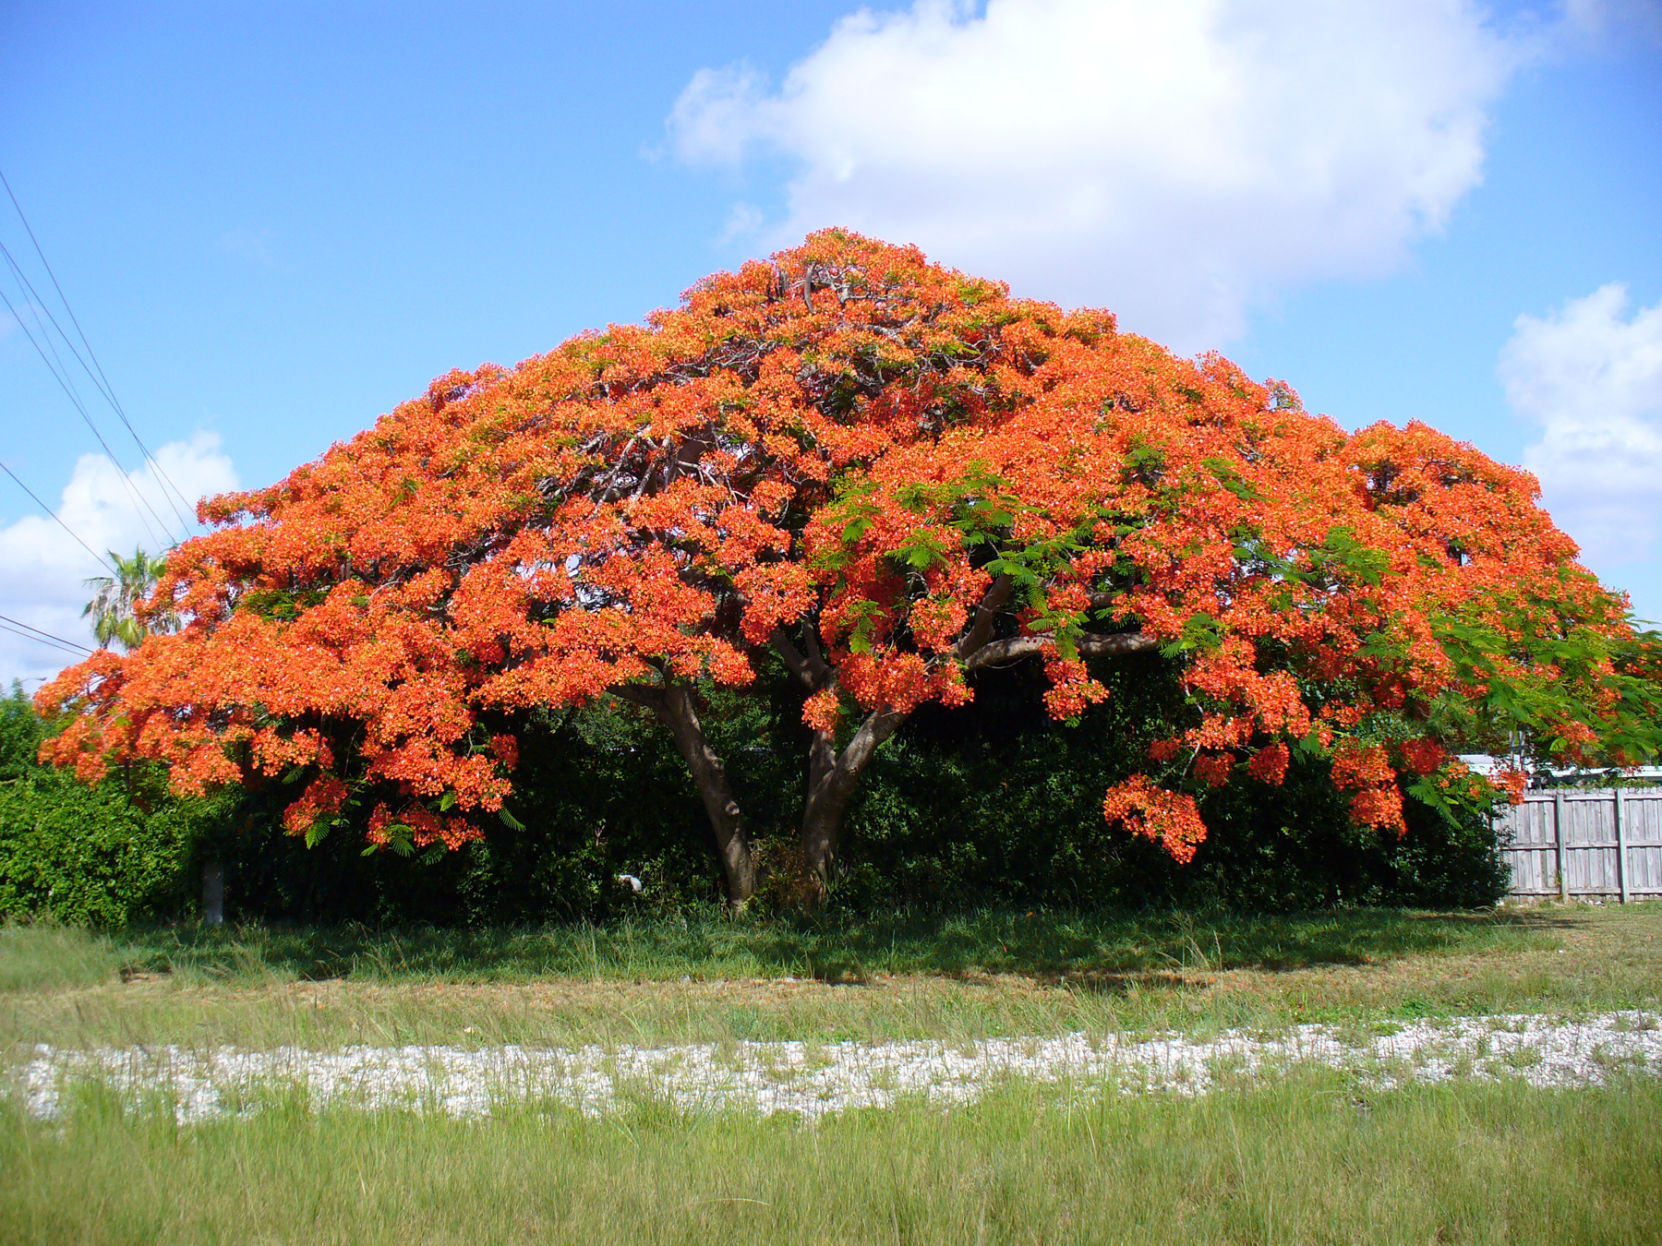 Swish Growing Royal Poinciana Trees Growing Royal Poinciana Trees Royal Poinciana Tree Images Royal Poinciana Tree Phoenix houzz 01 Royal Poinciana Tree